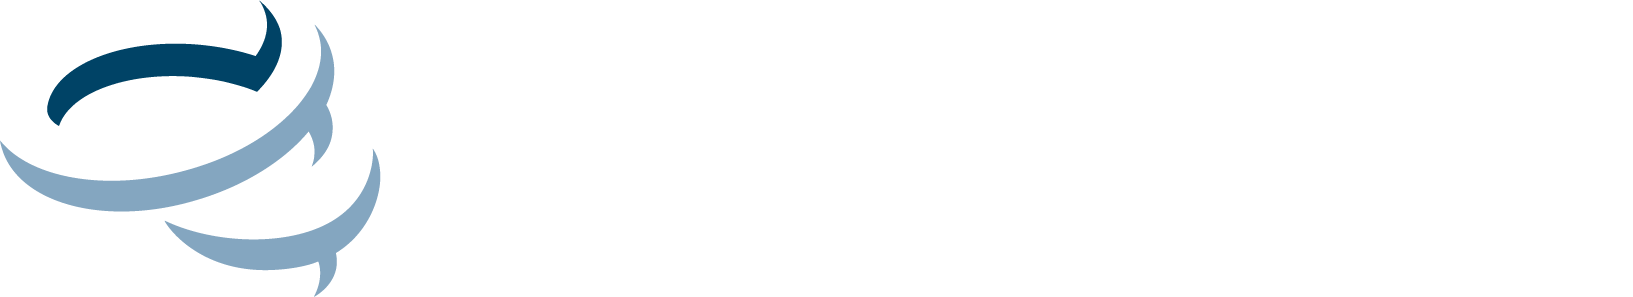 Prototal logo